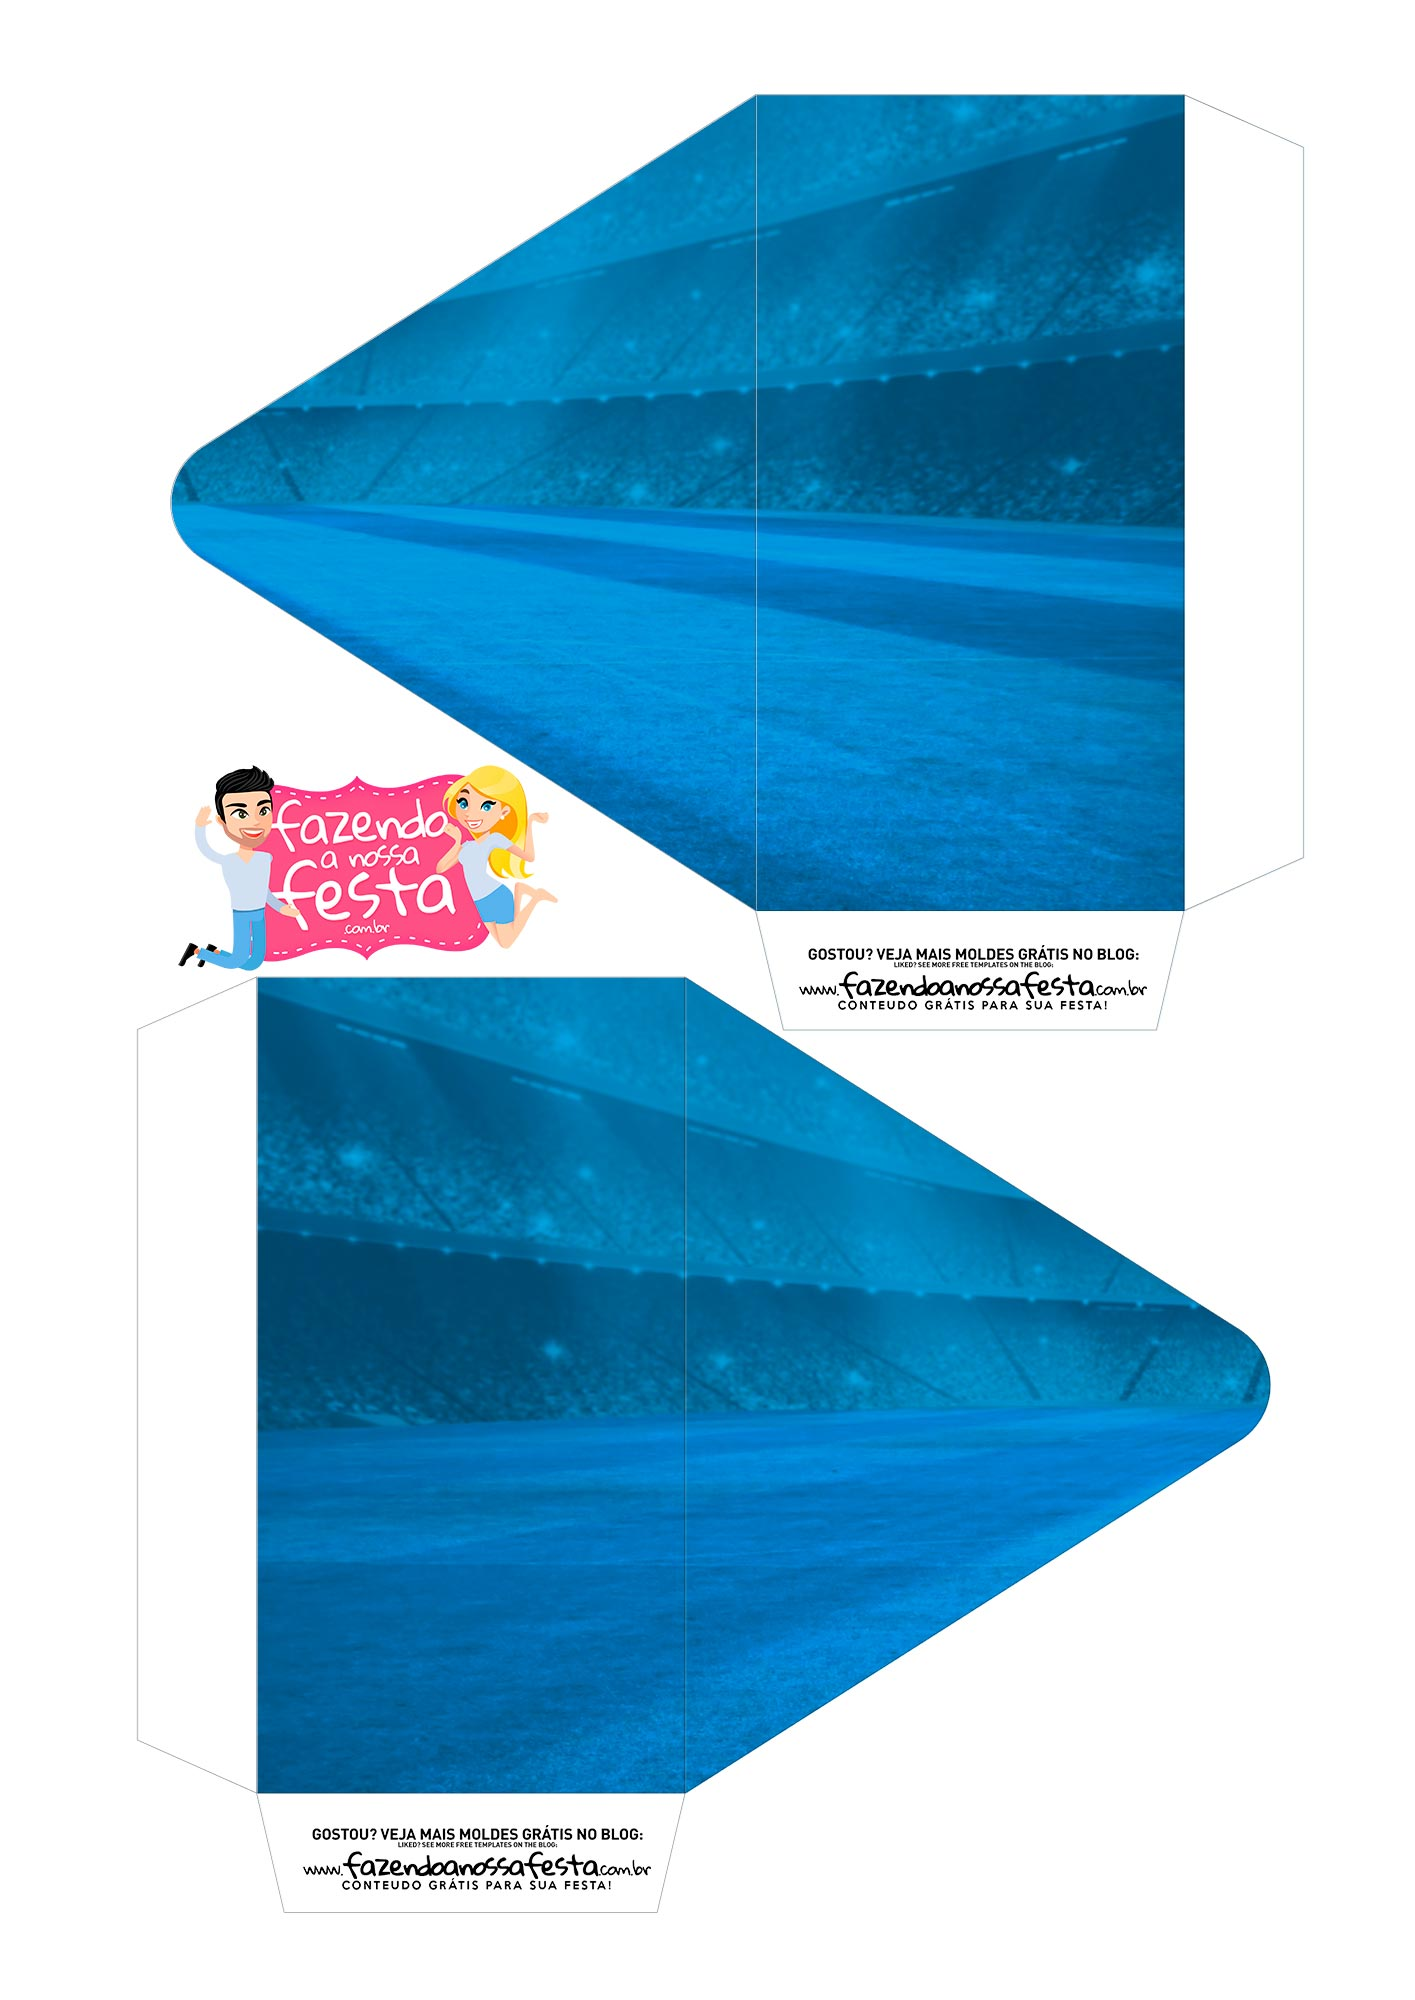 Caixa Envelope paysandu 1